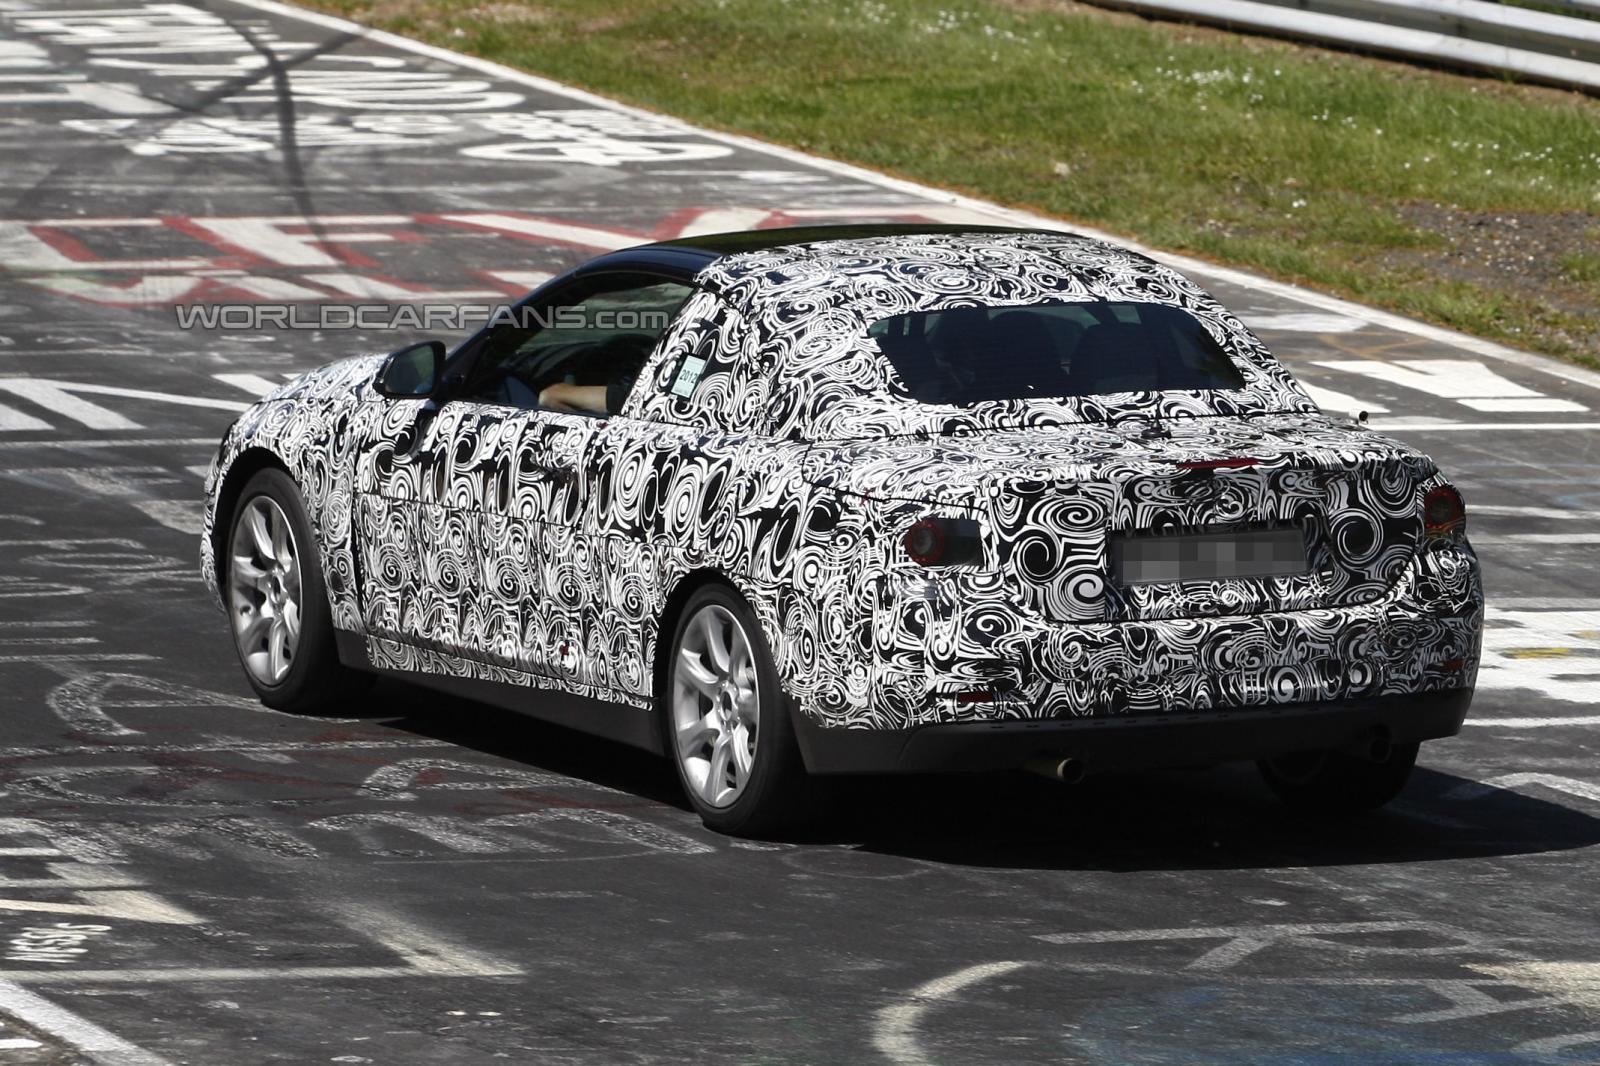 BMW 4 Series spyshots